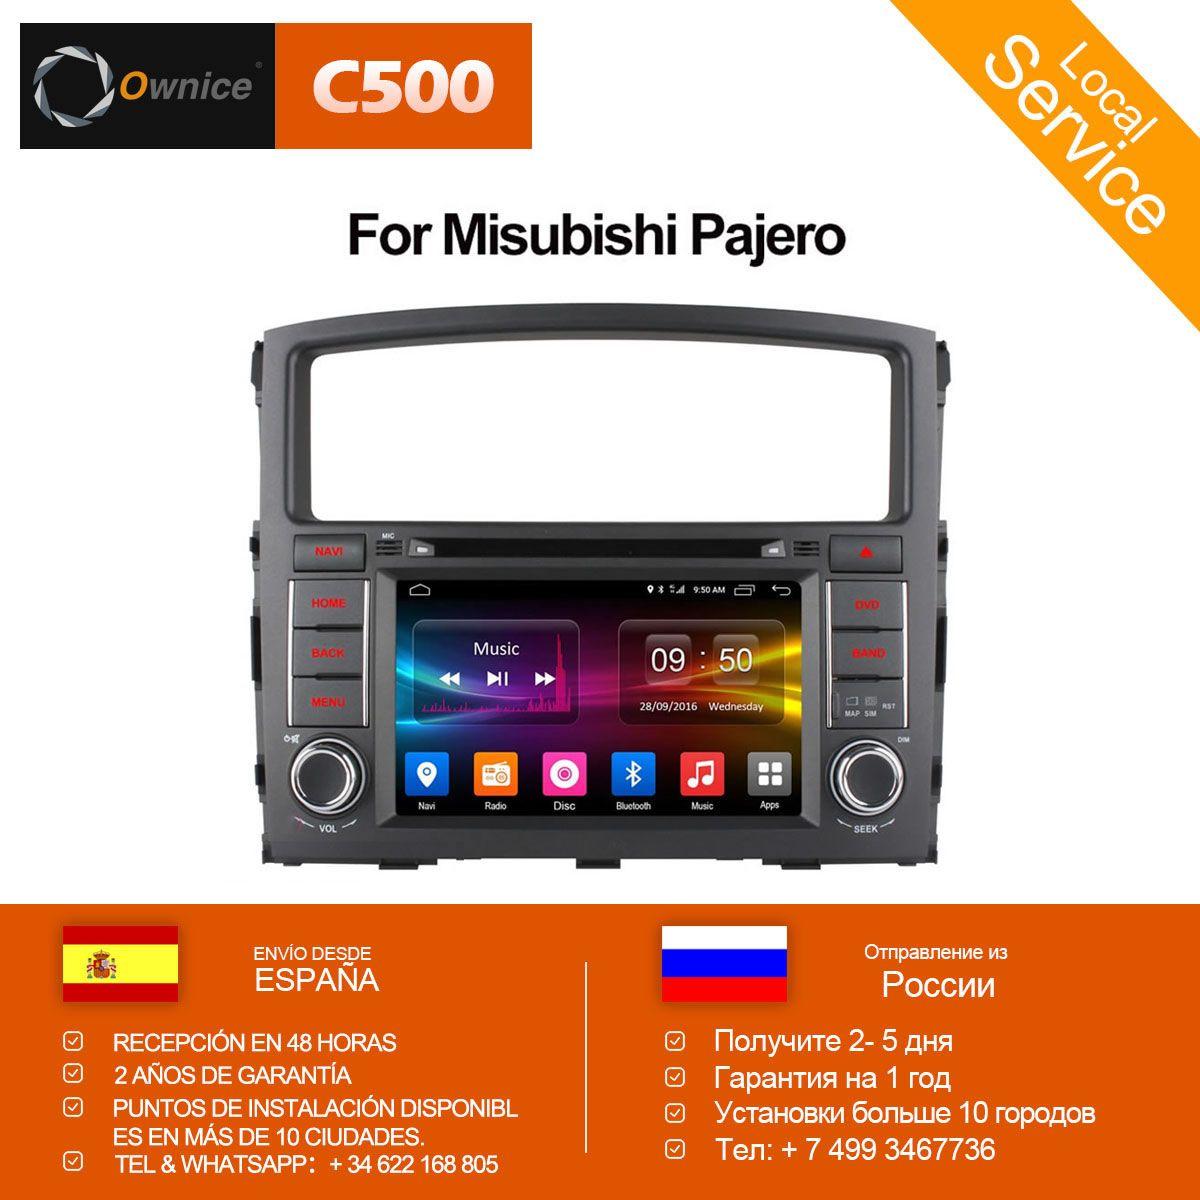 Ownice C500 Octa 8 Core Android 6.0 Für MITSUBISHI PAJERO V97 V93 2006-2015 Auto DVD Player GPS Navi unterstützung 4g DAB + TPMS 32g ROM